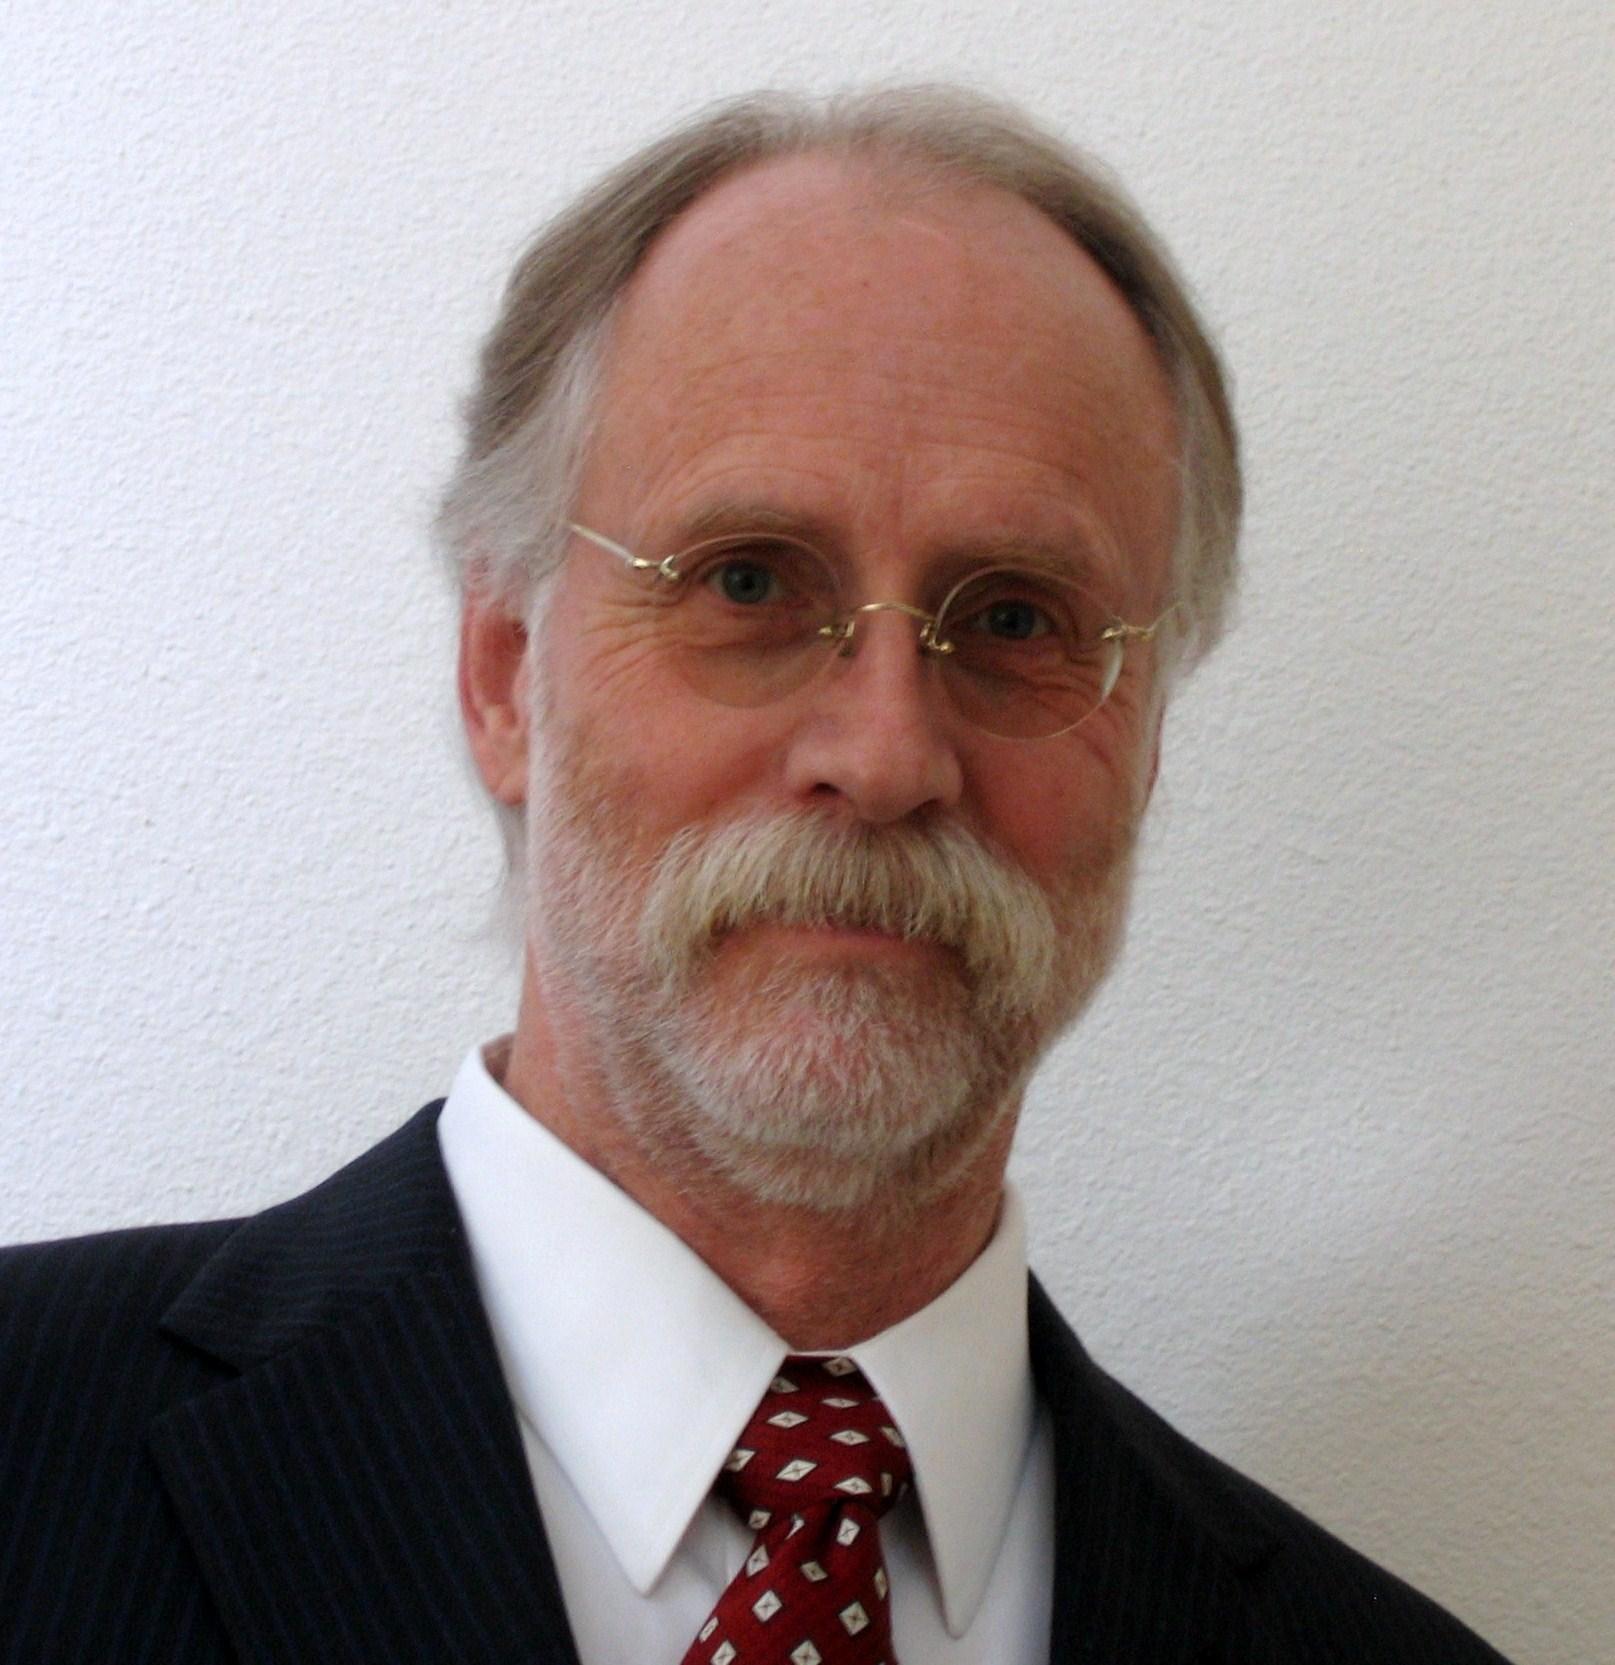 Michael Evan Galbraith